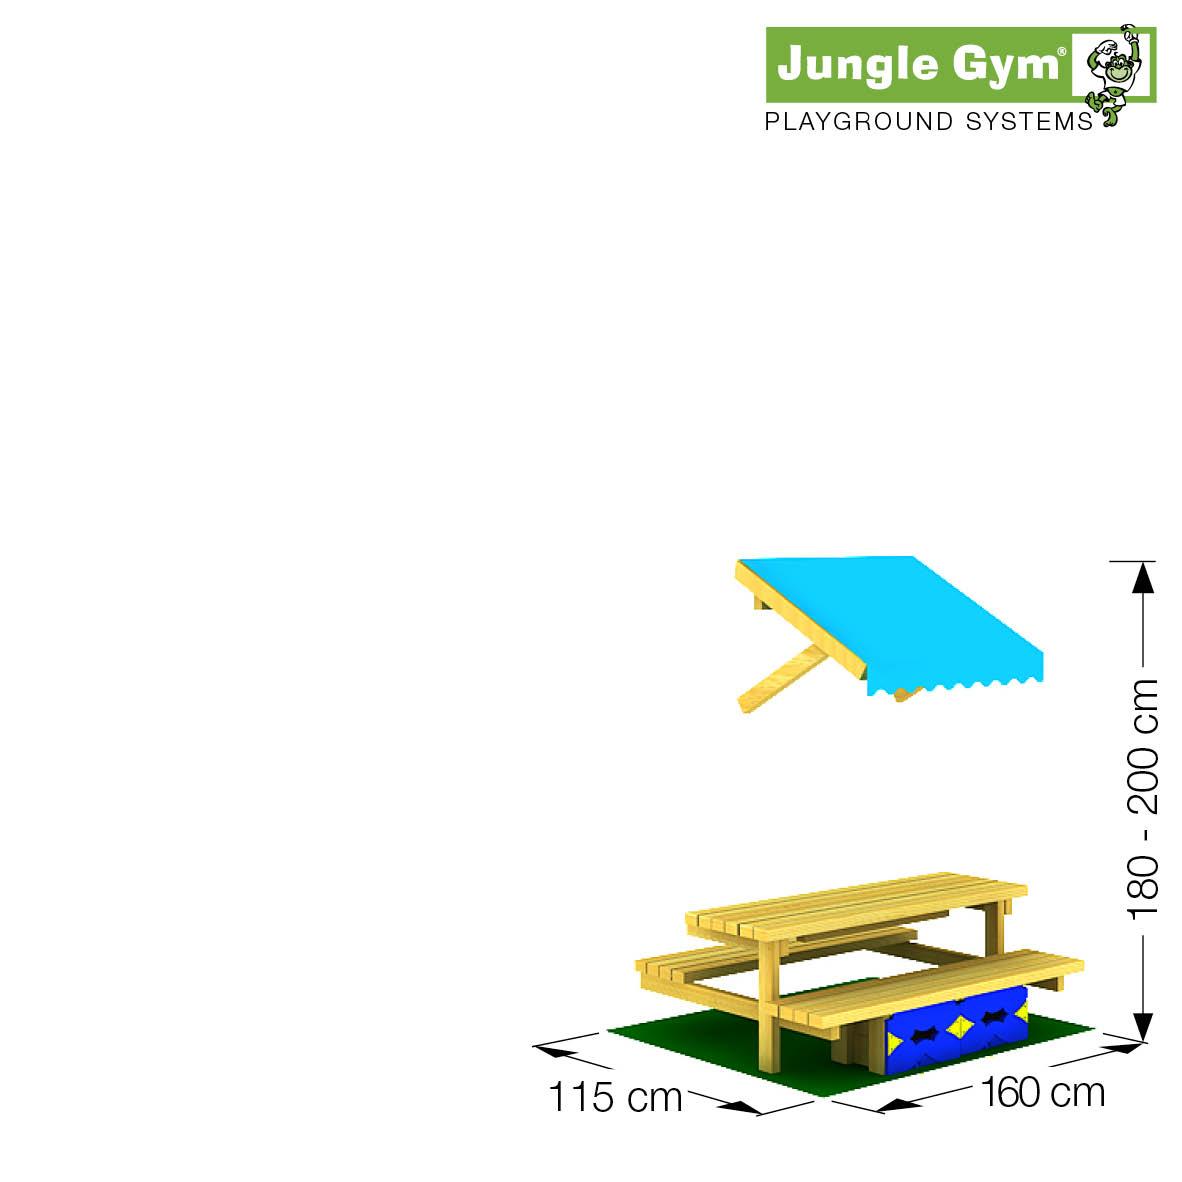 850_263_1581_Mini_Picnic_Module_160_cm_10x10